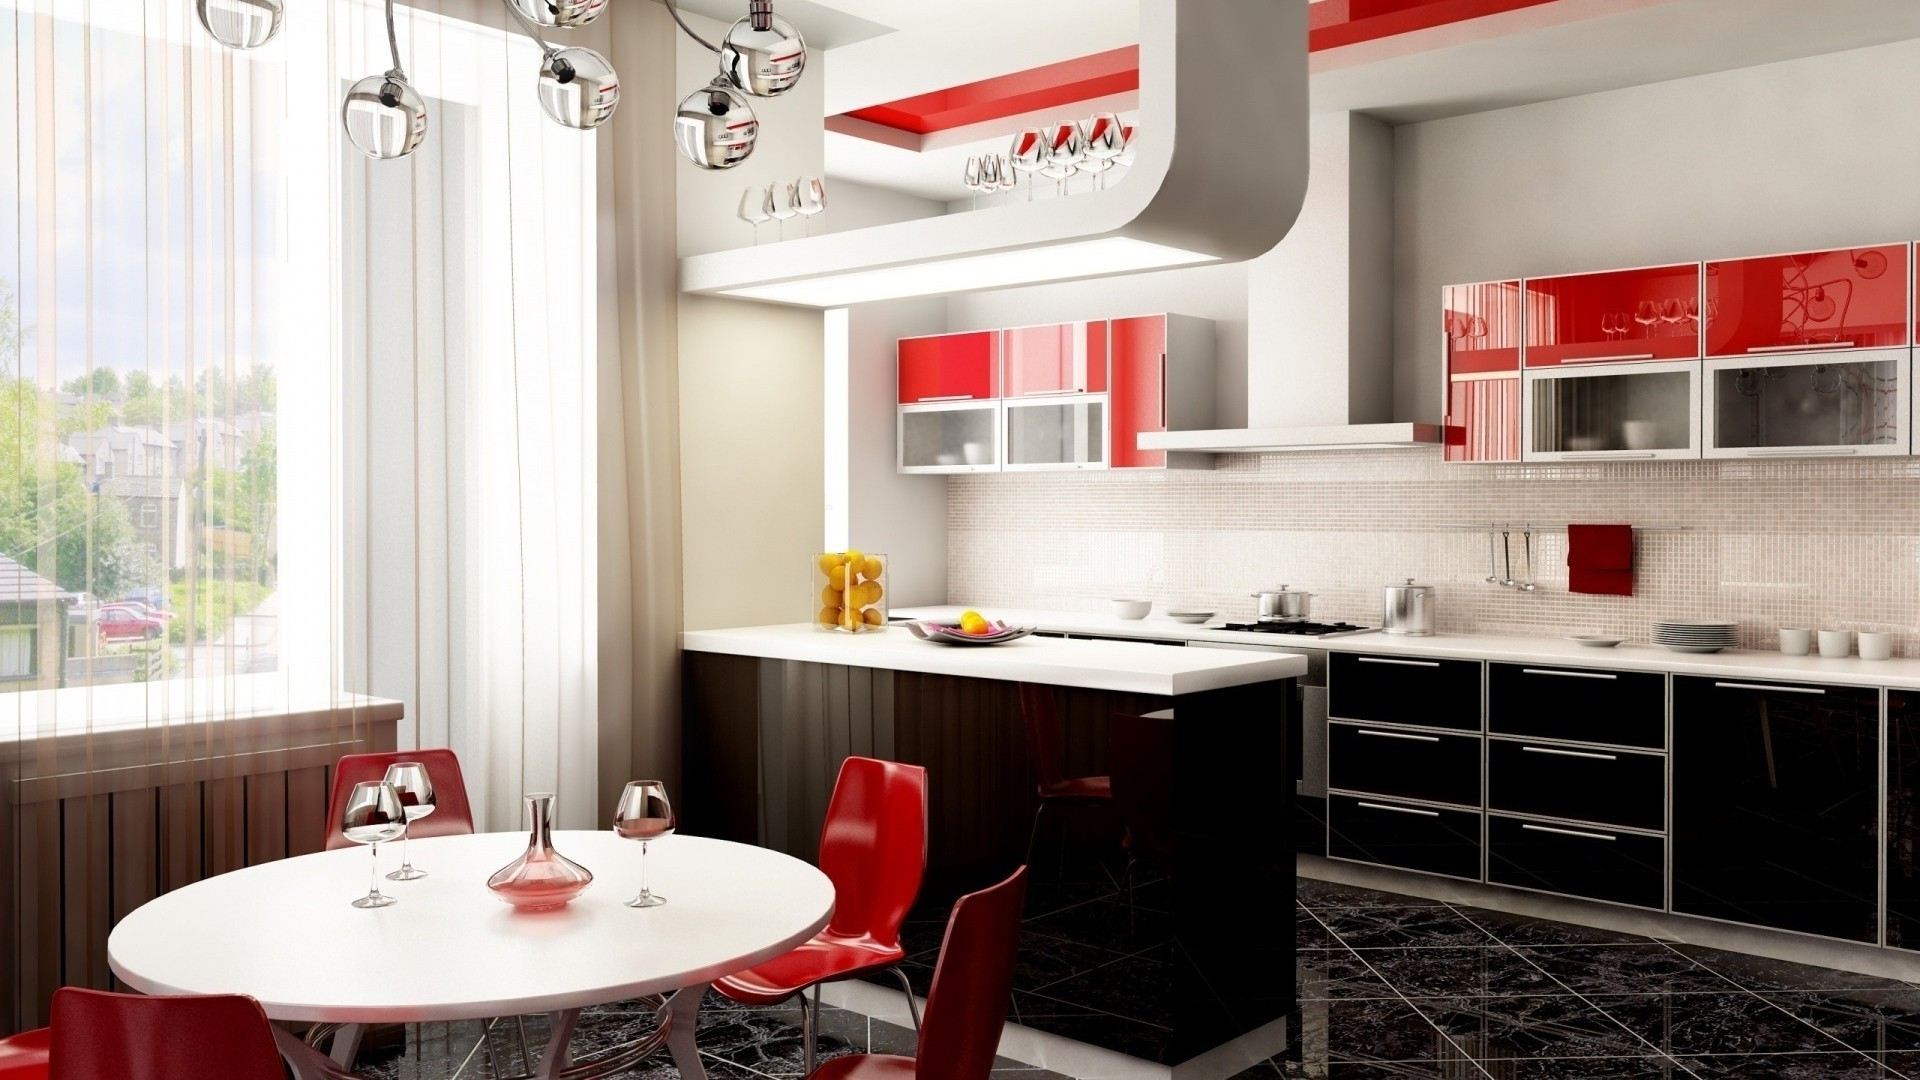 Amazoncom red white and blue kitchen decor